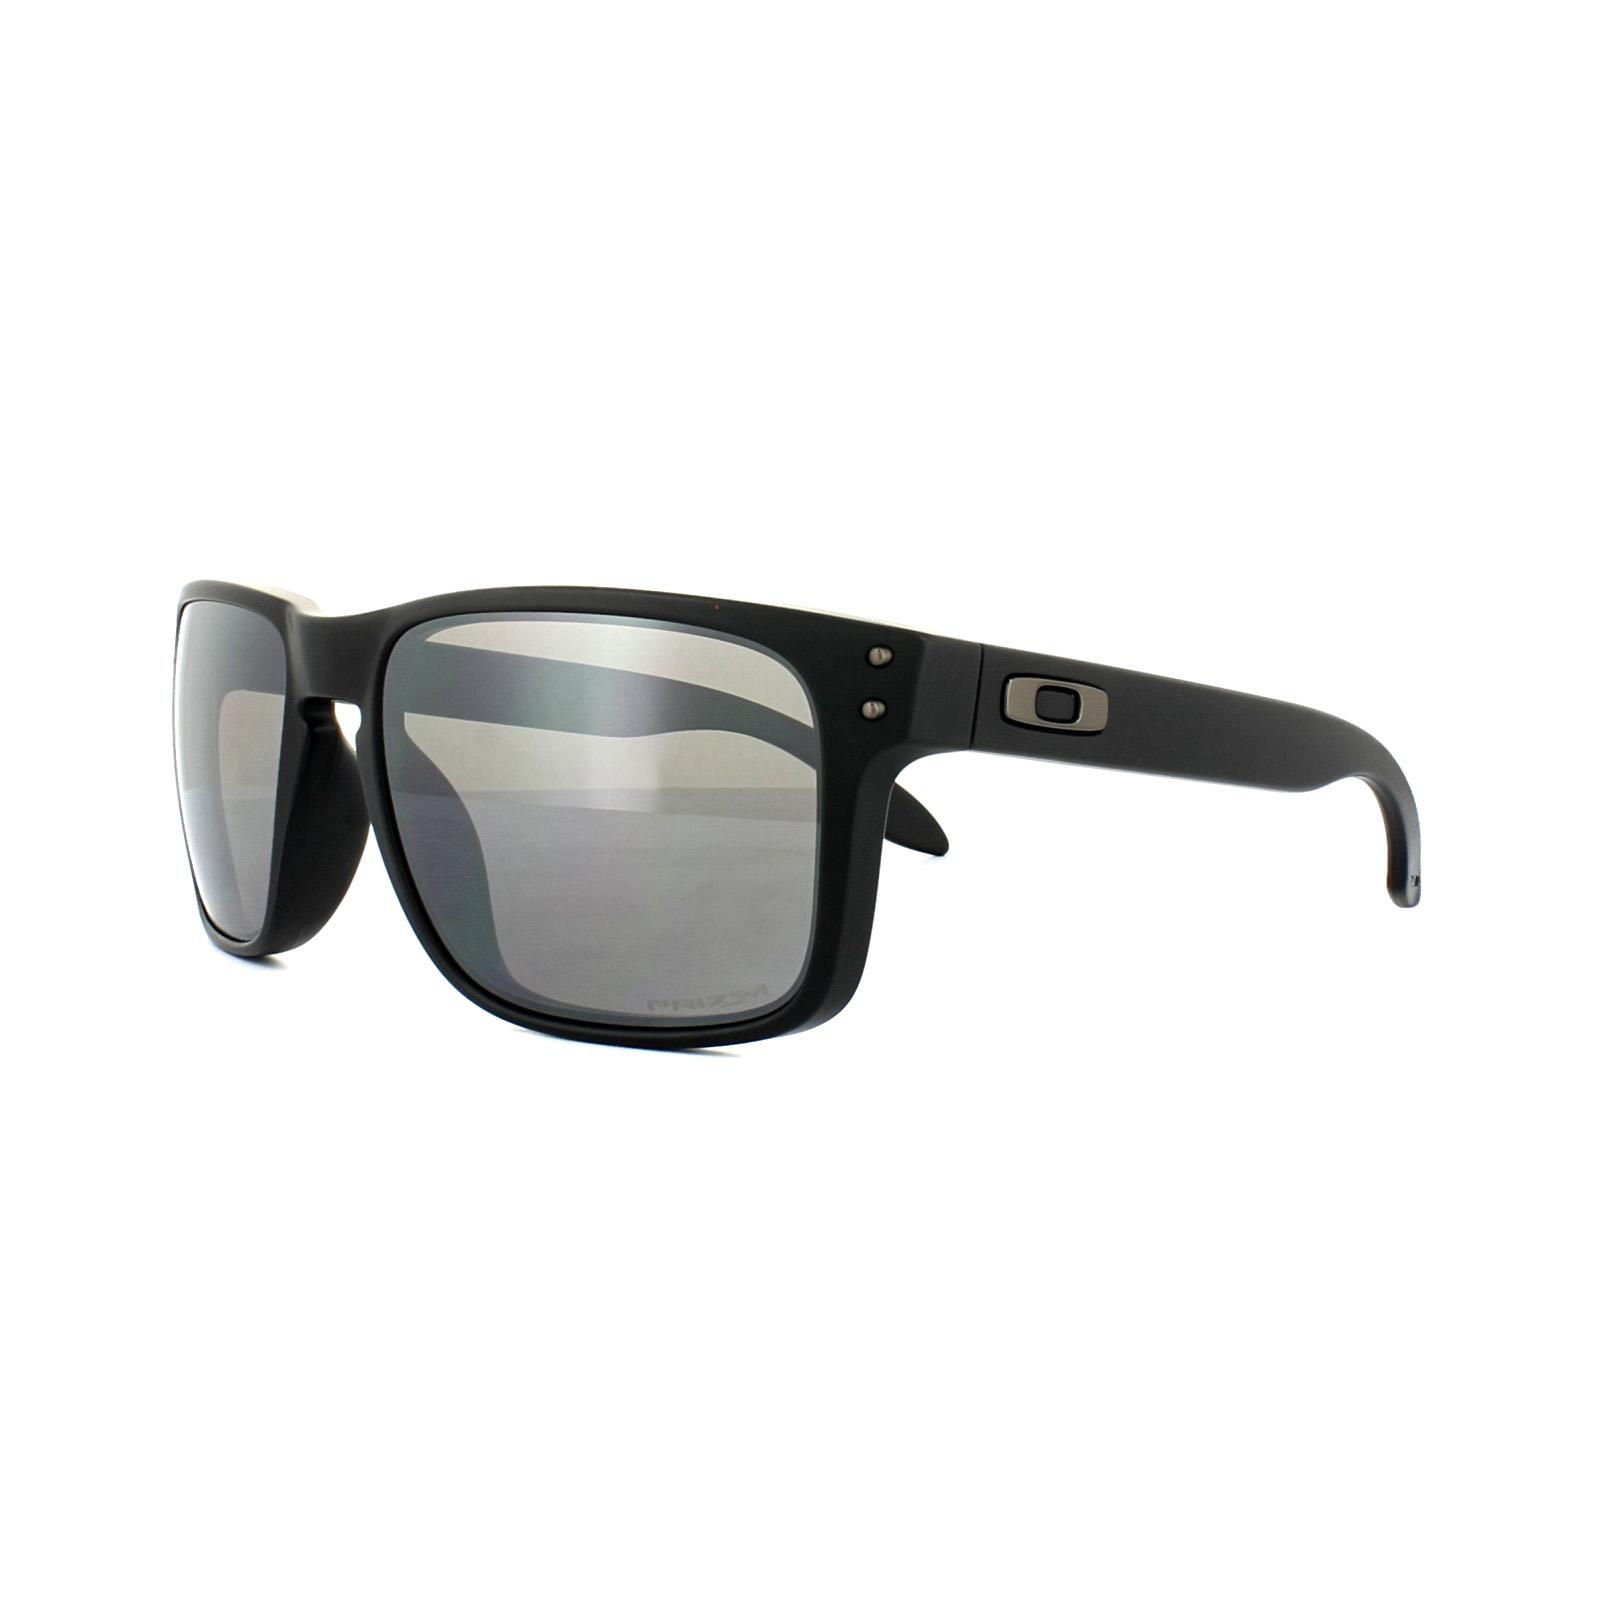 96eb18903c Sentinel Oakley Sunglasses Holbrook OO9102-D6 Matt Black Prizm Black  Polarized